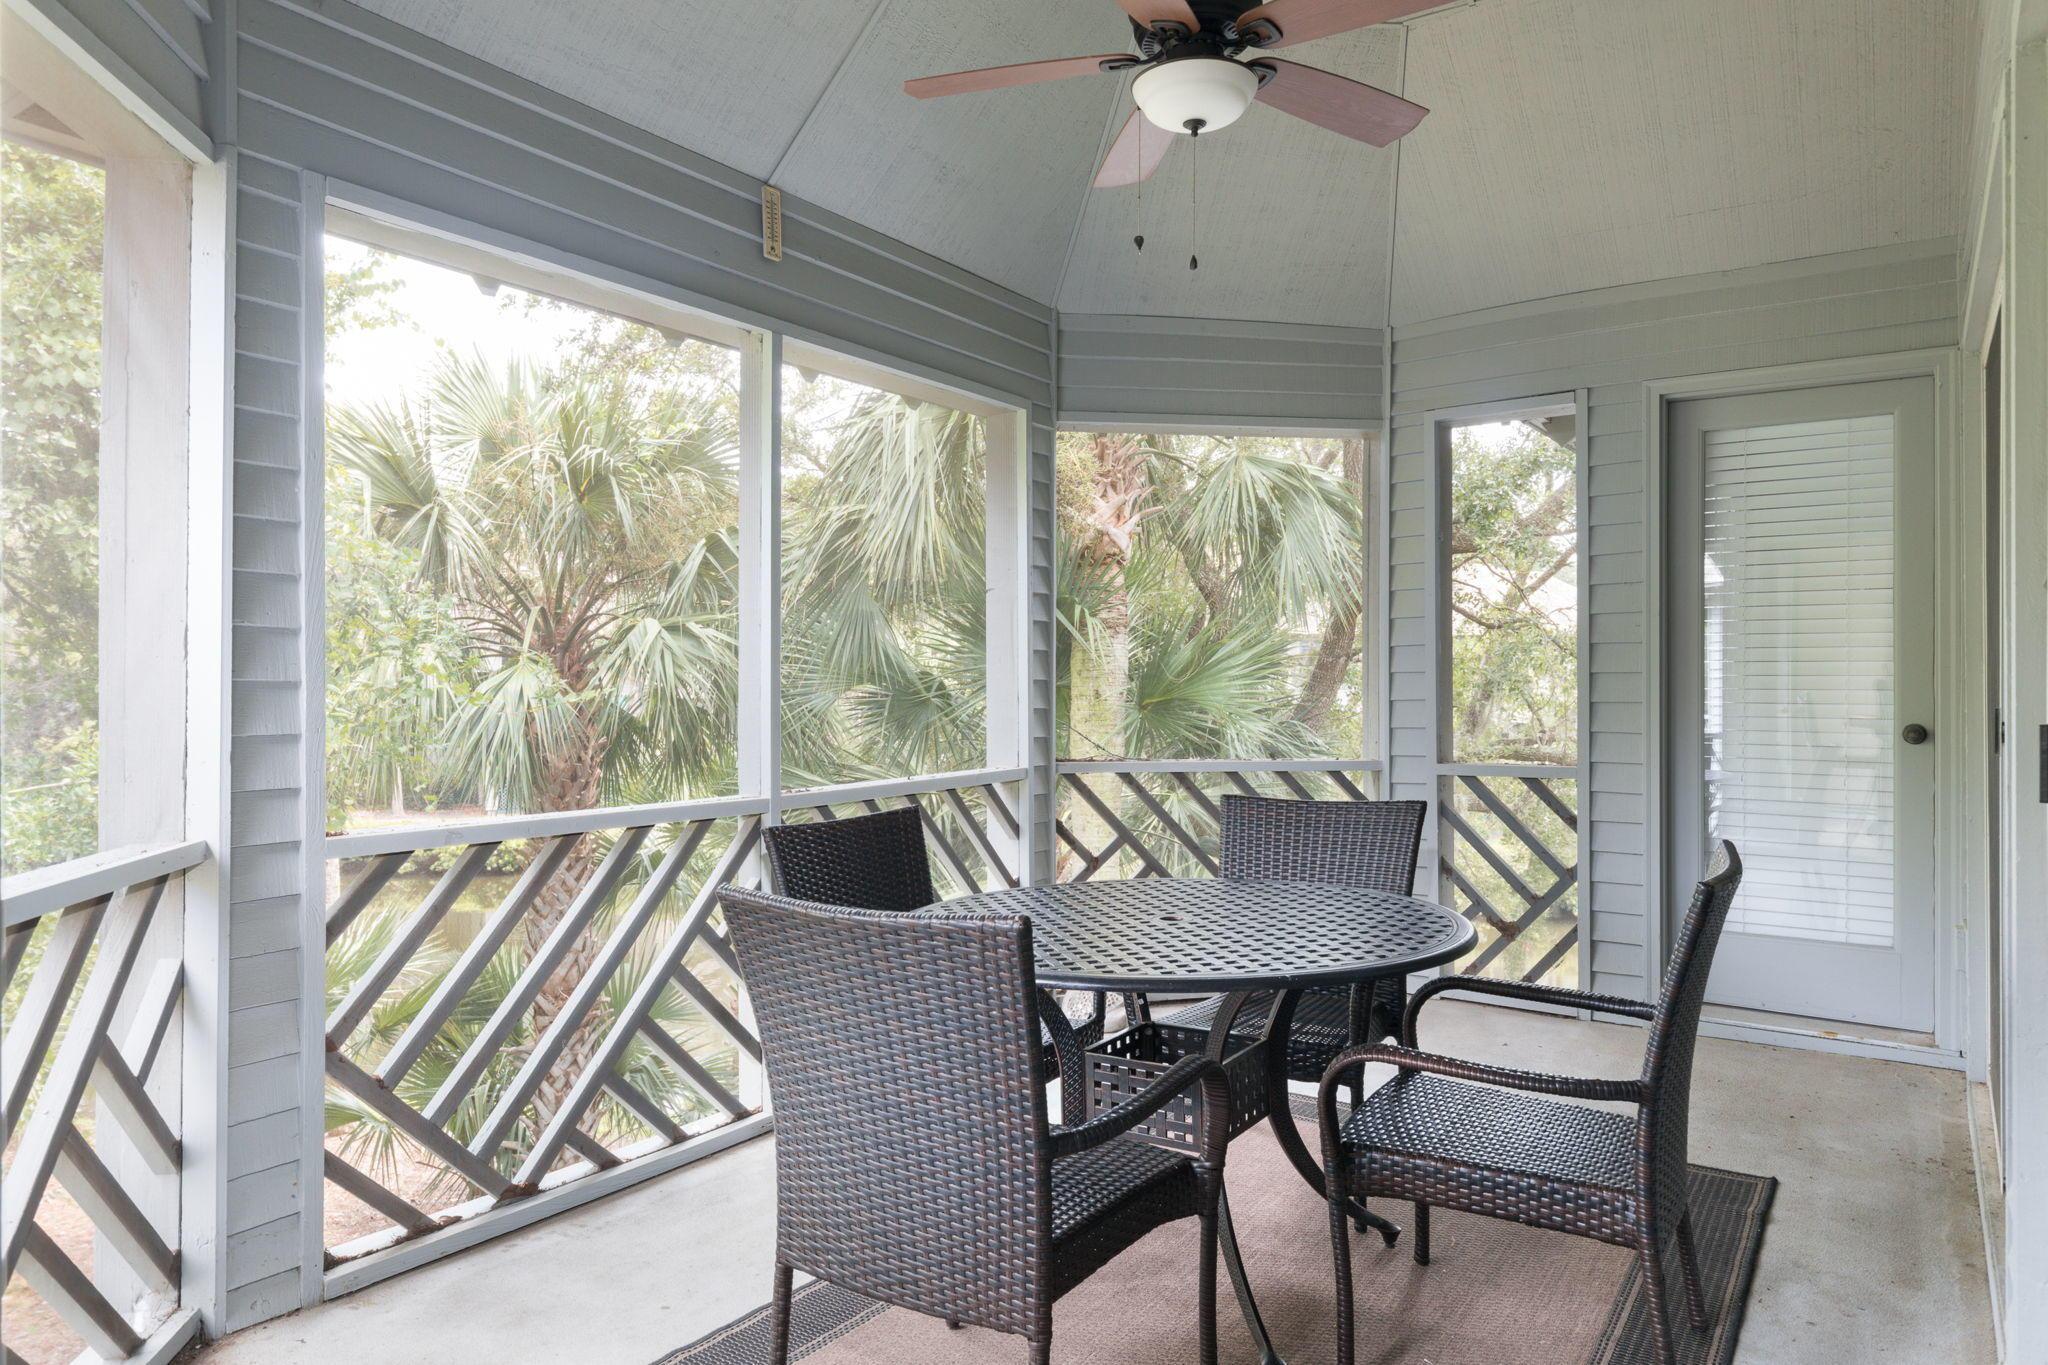 Kiawah Island Homes For Sale - 5534 Green Dolphin, Kiawah Island, SC - 33